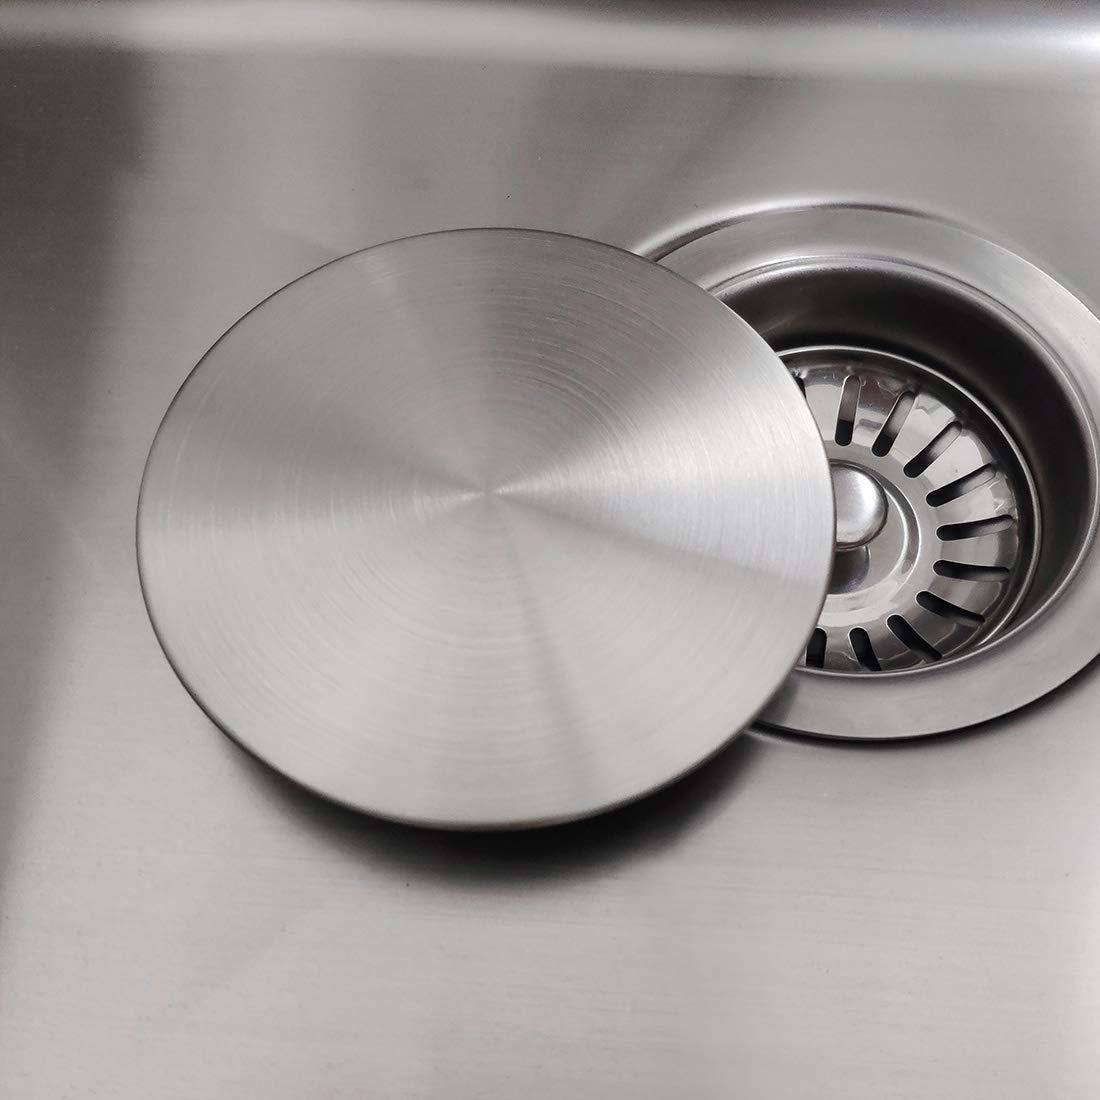 Kitchen Sink Drain Stopper.Gzila Kitchen Sink Stopper Flat Decor Cover 304 Stainless Steel Sink Drain Stopper Fits 3 5 Standard Strainer Brushed Nickel